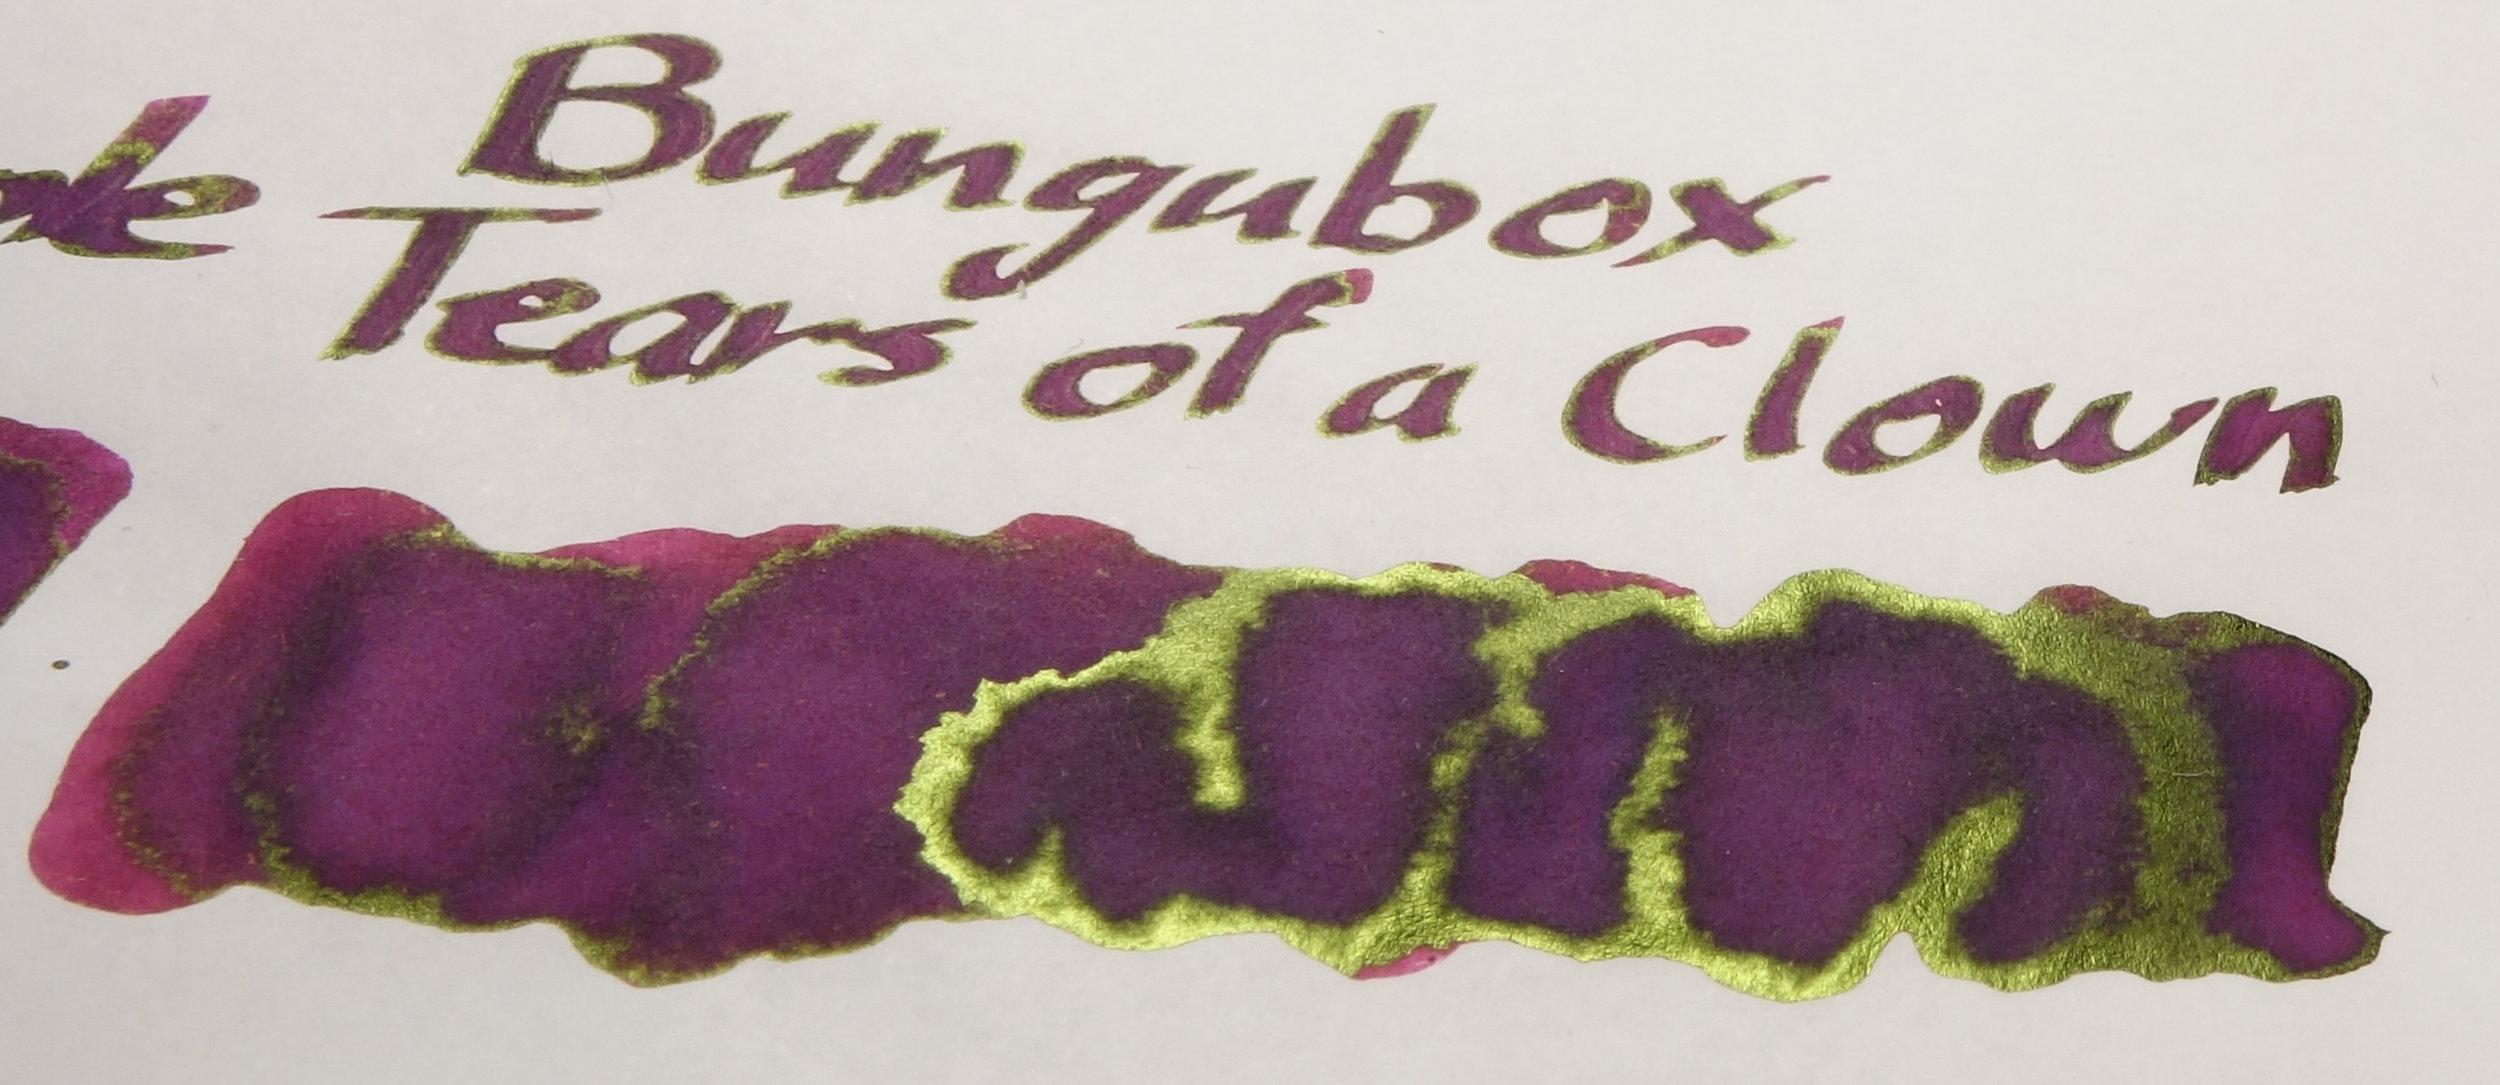 Sheen Bungubox Tears of a Clown.JPG